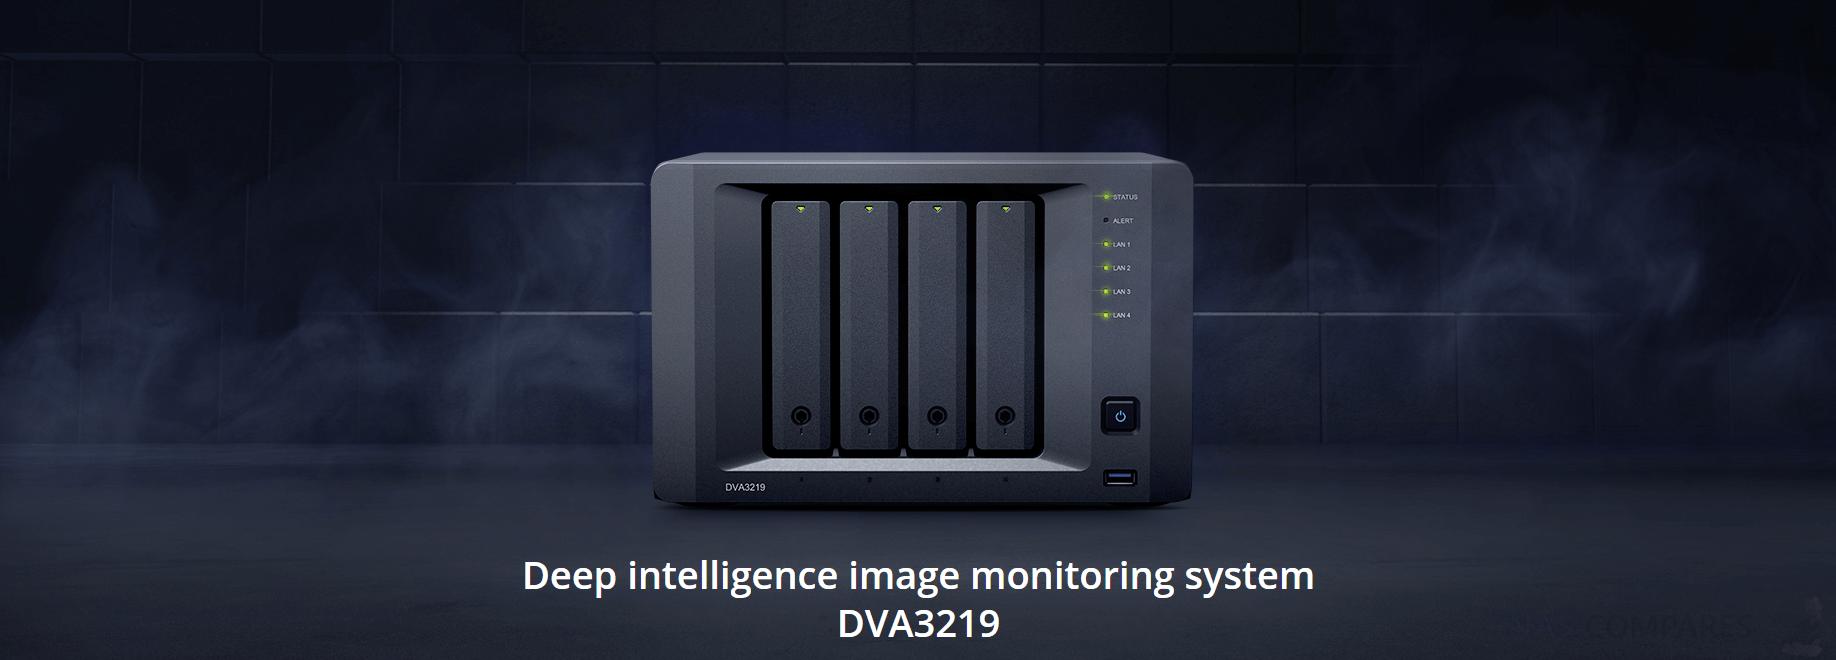 Synology-DVA3219-Deep-Learning-AI-Powered-Surveillance-NAS-0